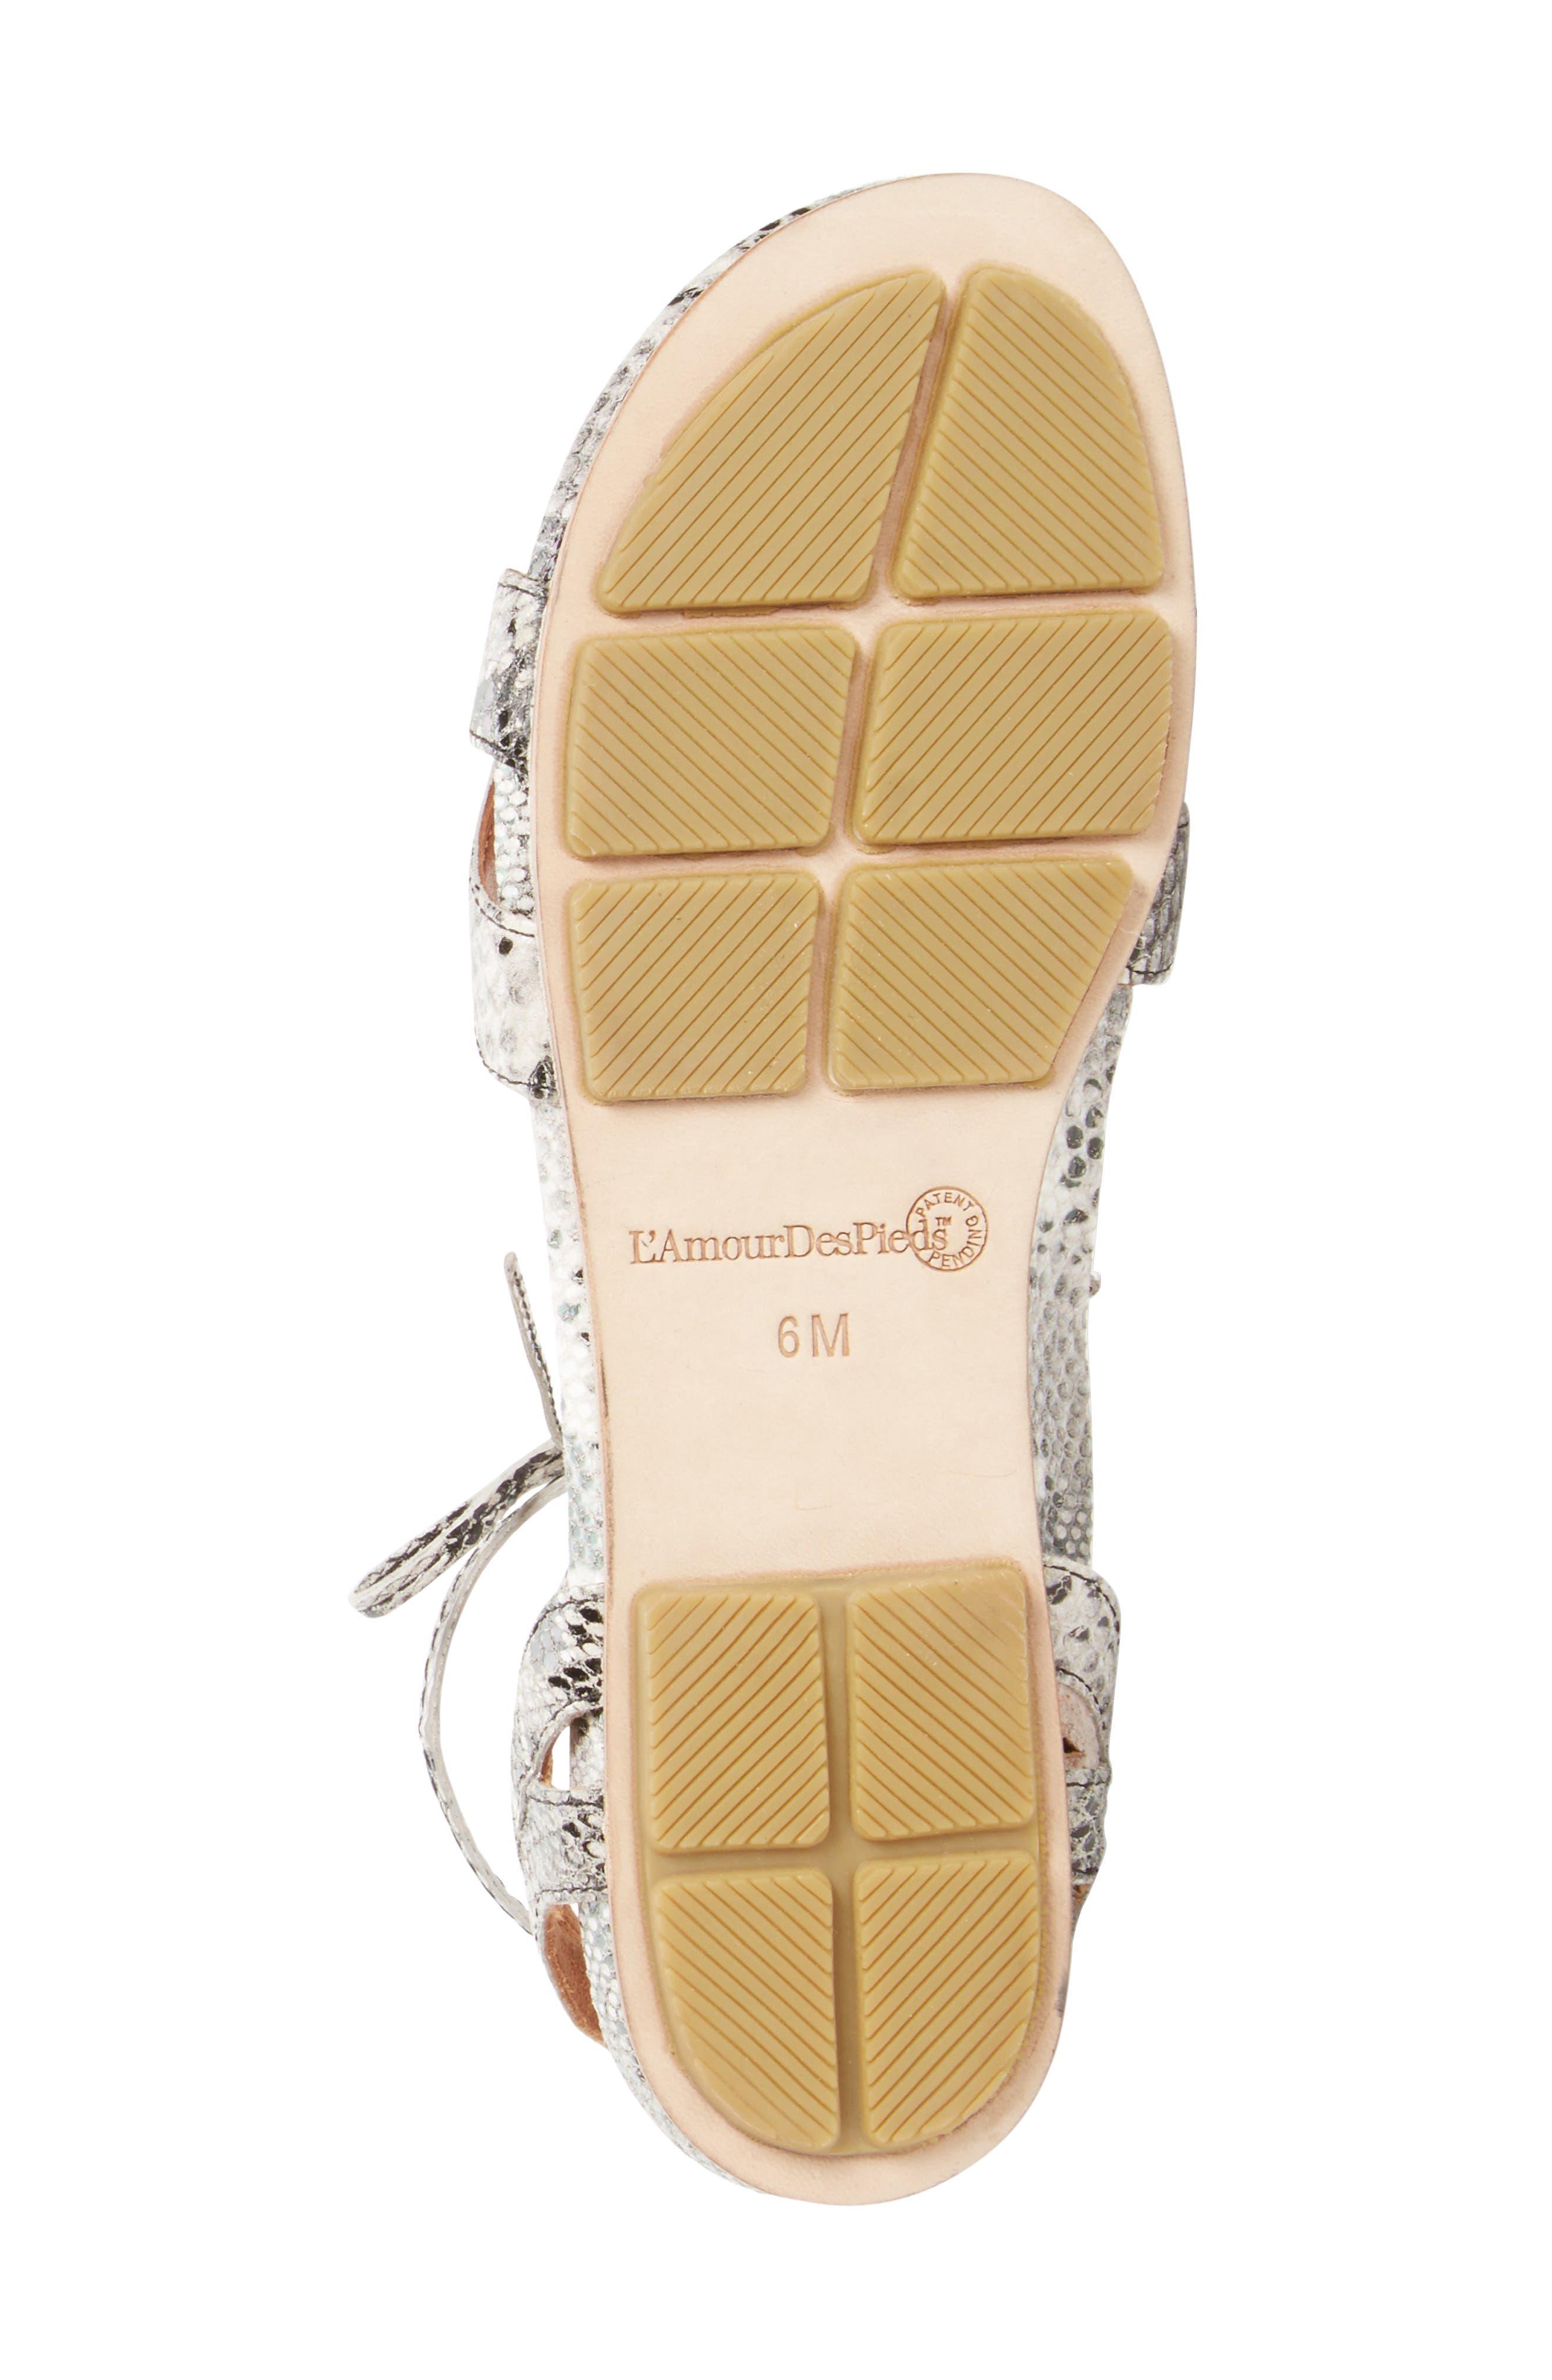 Darrylynn Wraparound Lace-Up Sandal,                             Alternate thumbnail 4, color,                             002